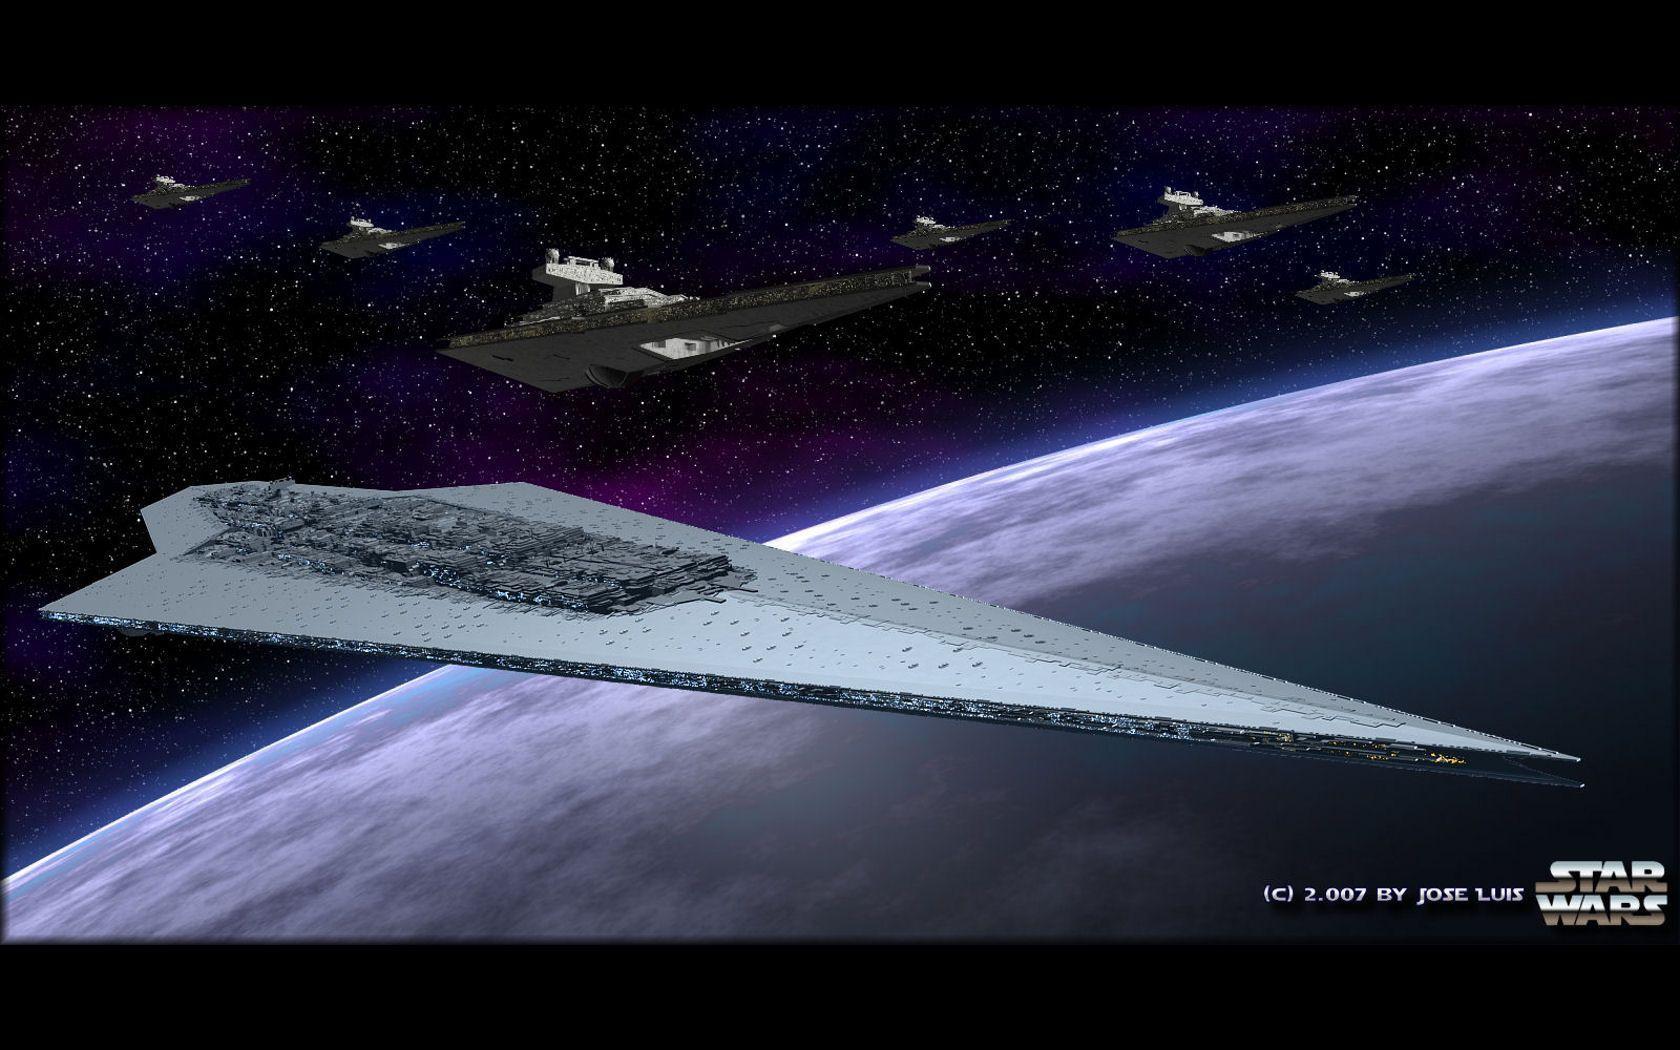 star wars empire wallpaper hd - photo #31